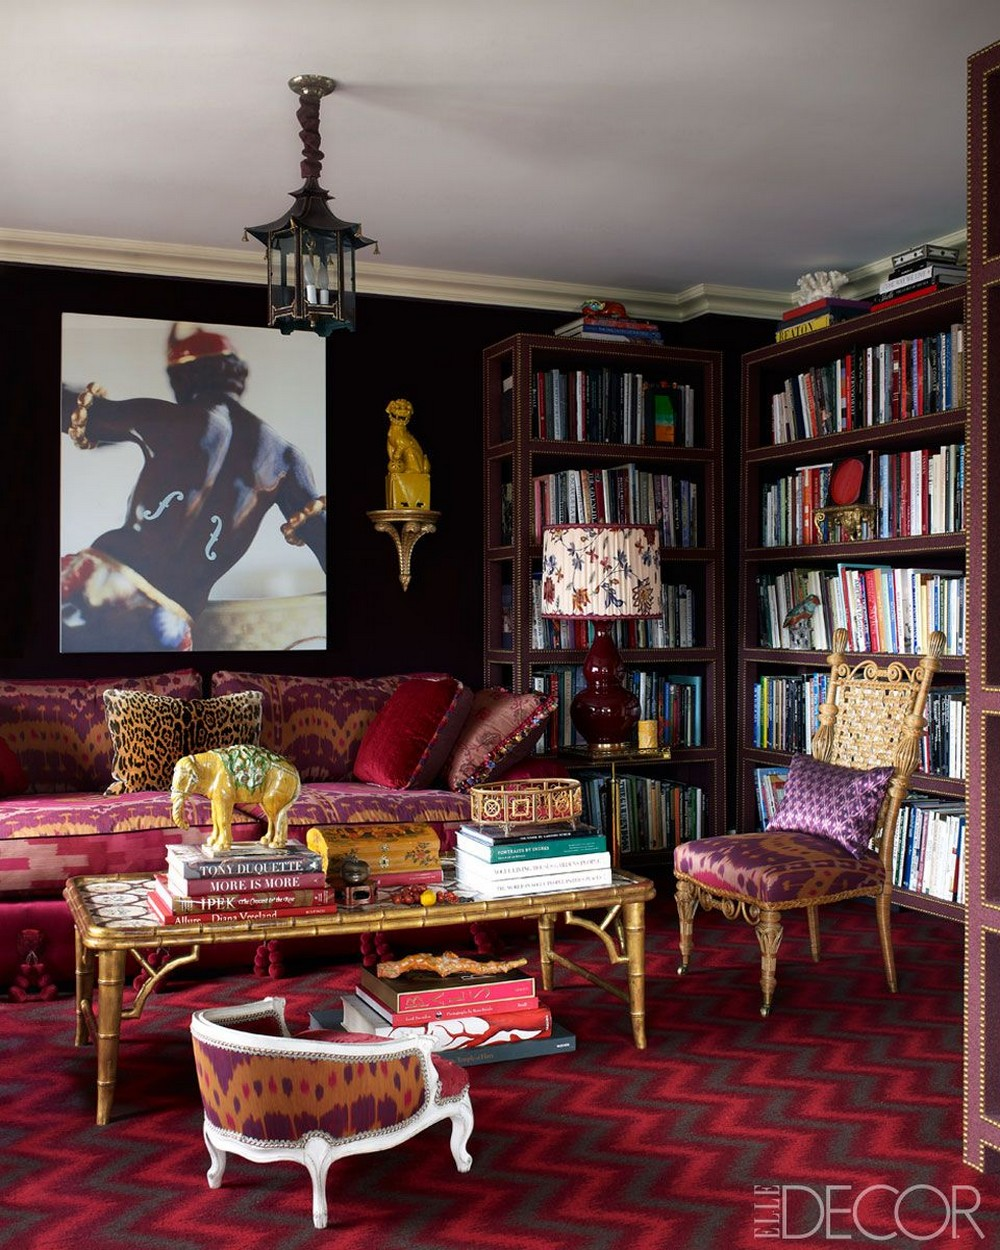 Alex Papachristidis: The Art of Bespoke Interior Design alex papachristidis Alex Papachristidis: The Art of Bespoke Interior Design 3 Elle decor